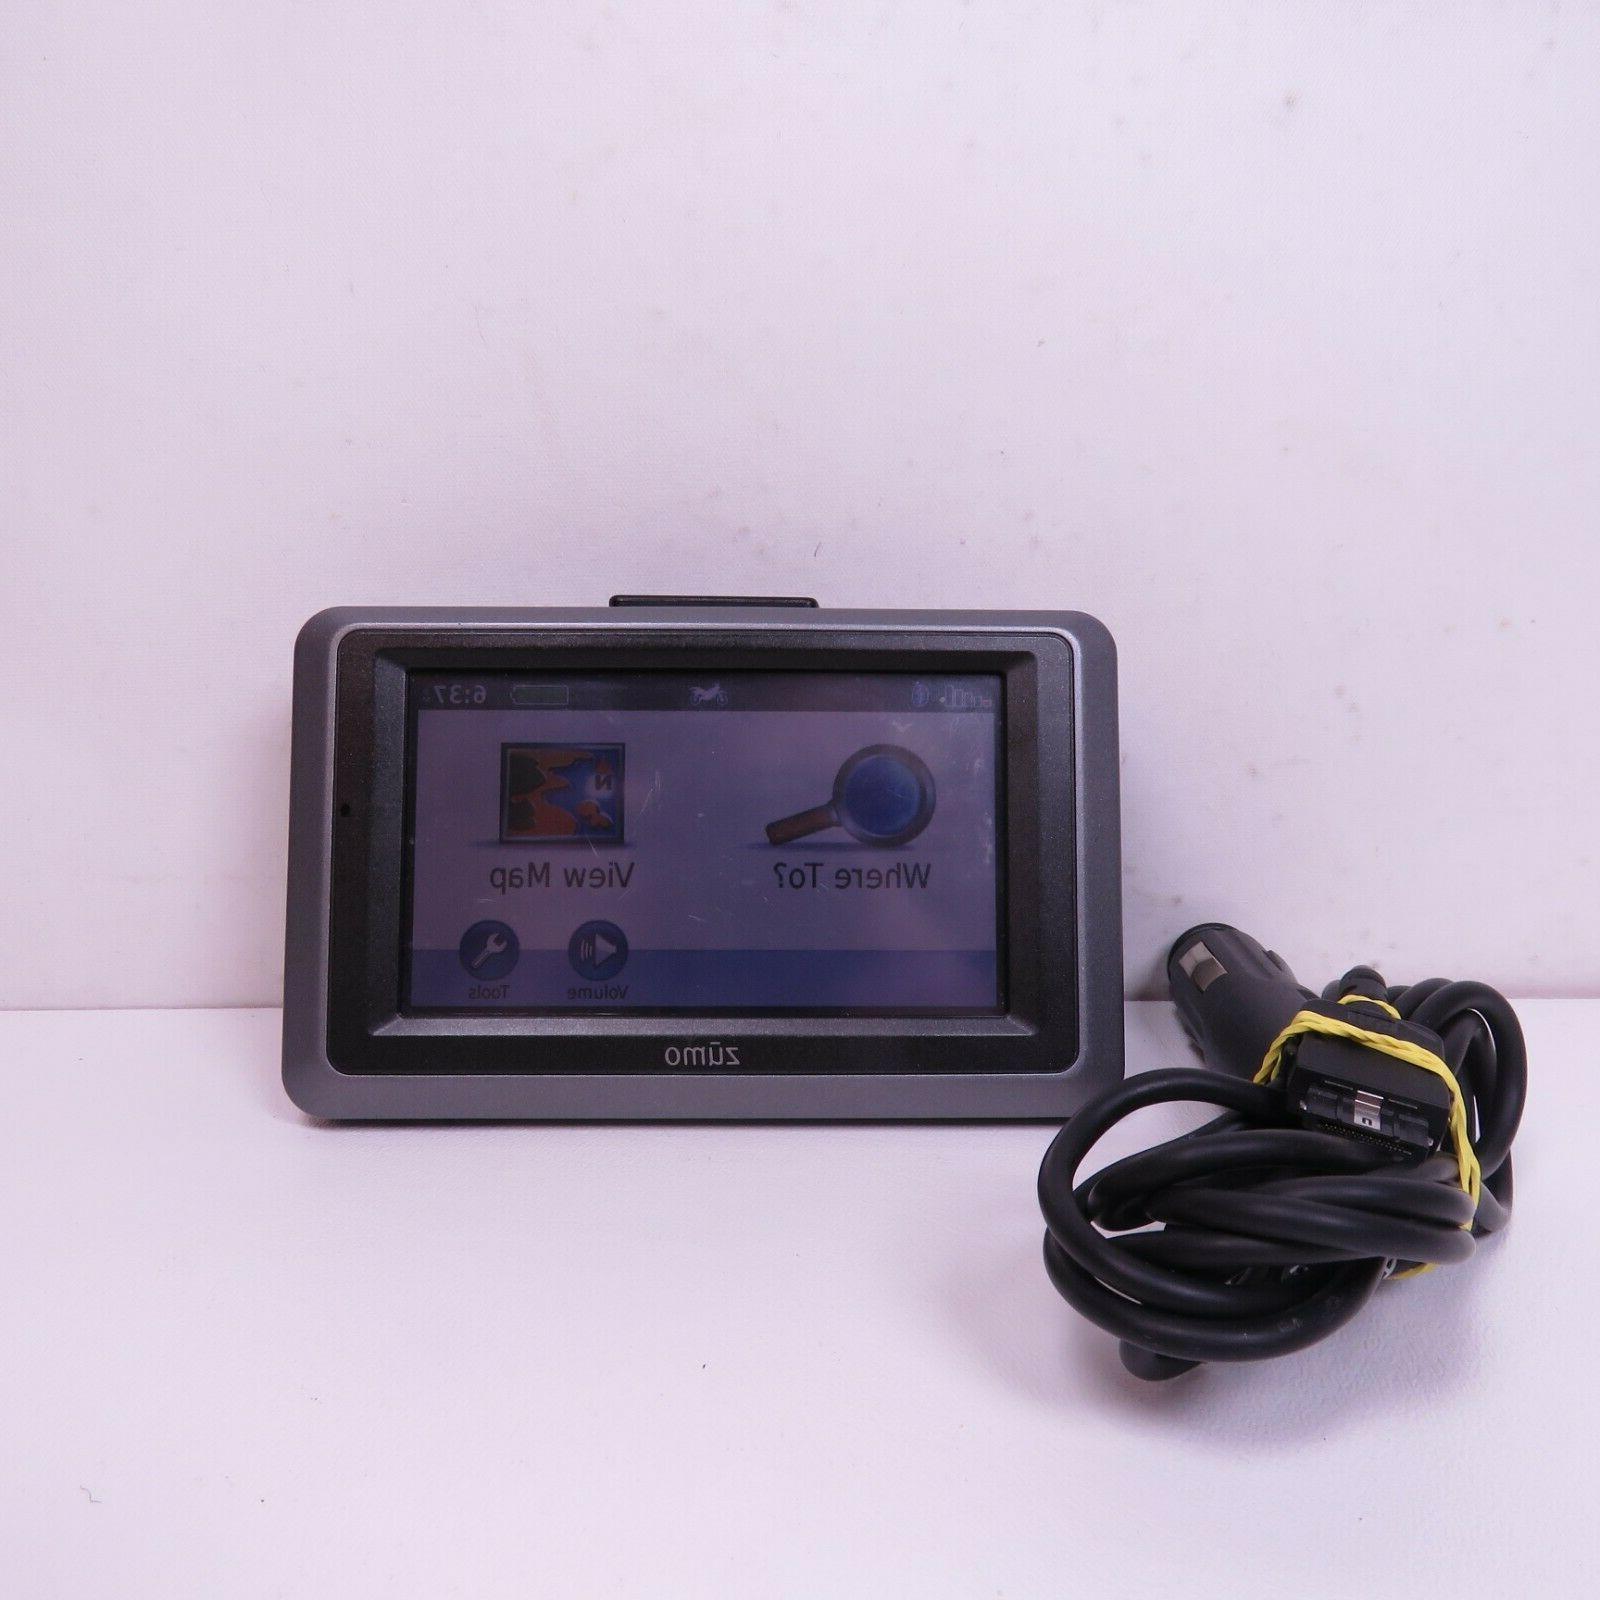 zumo 665 gps unit power tested